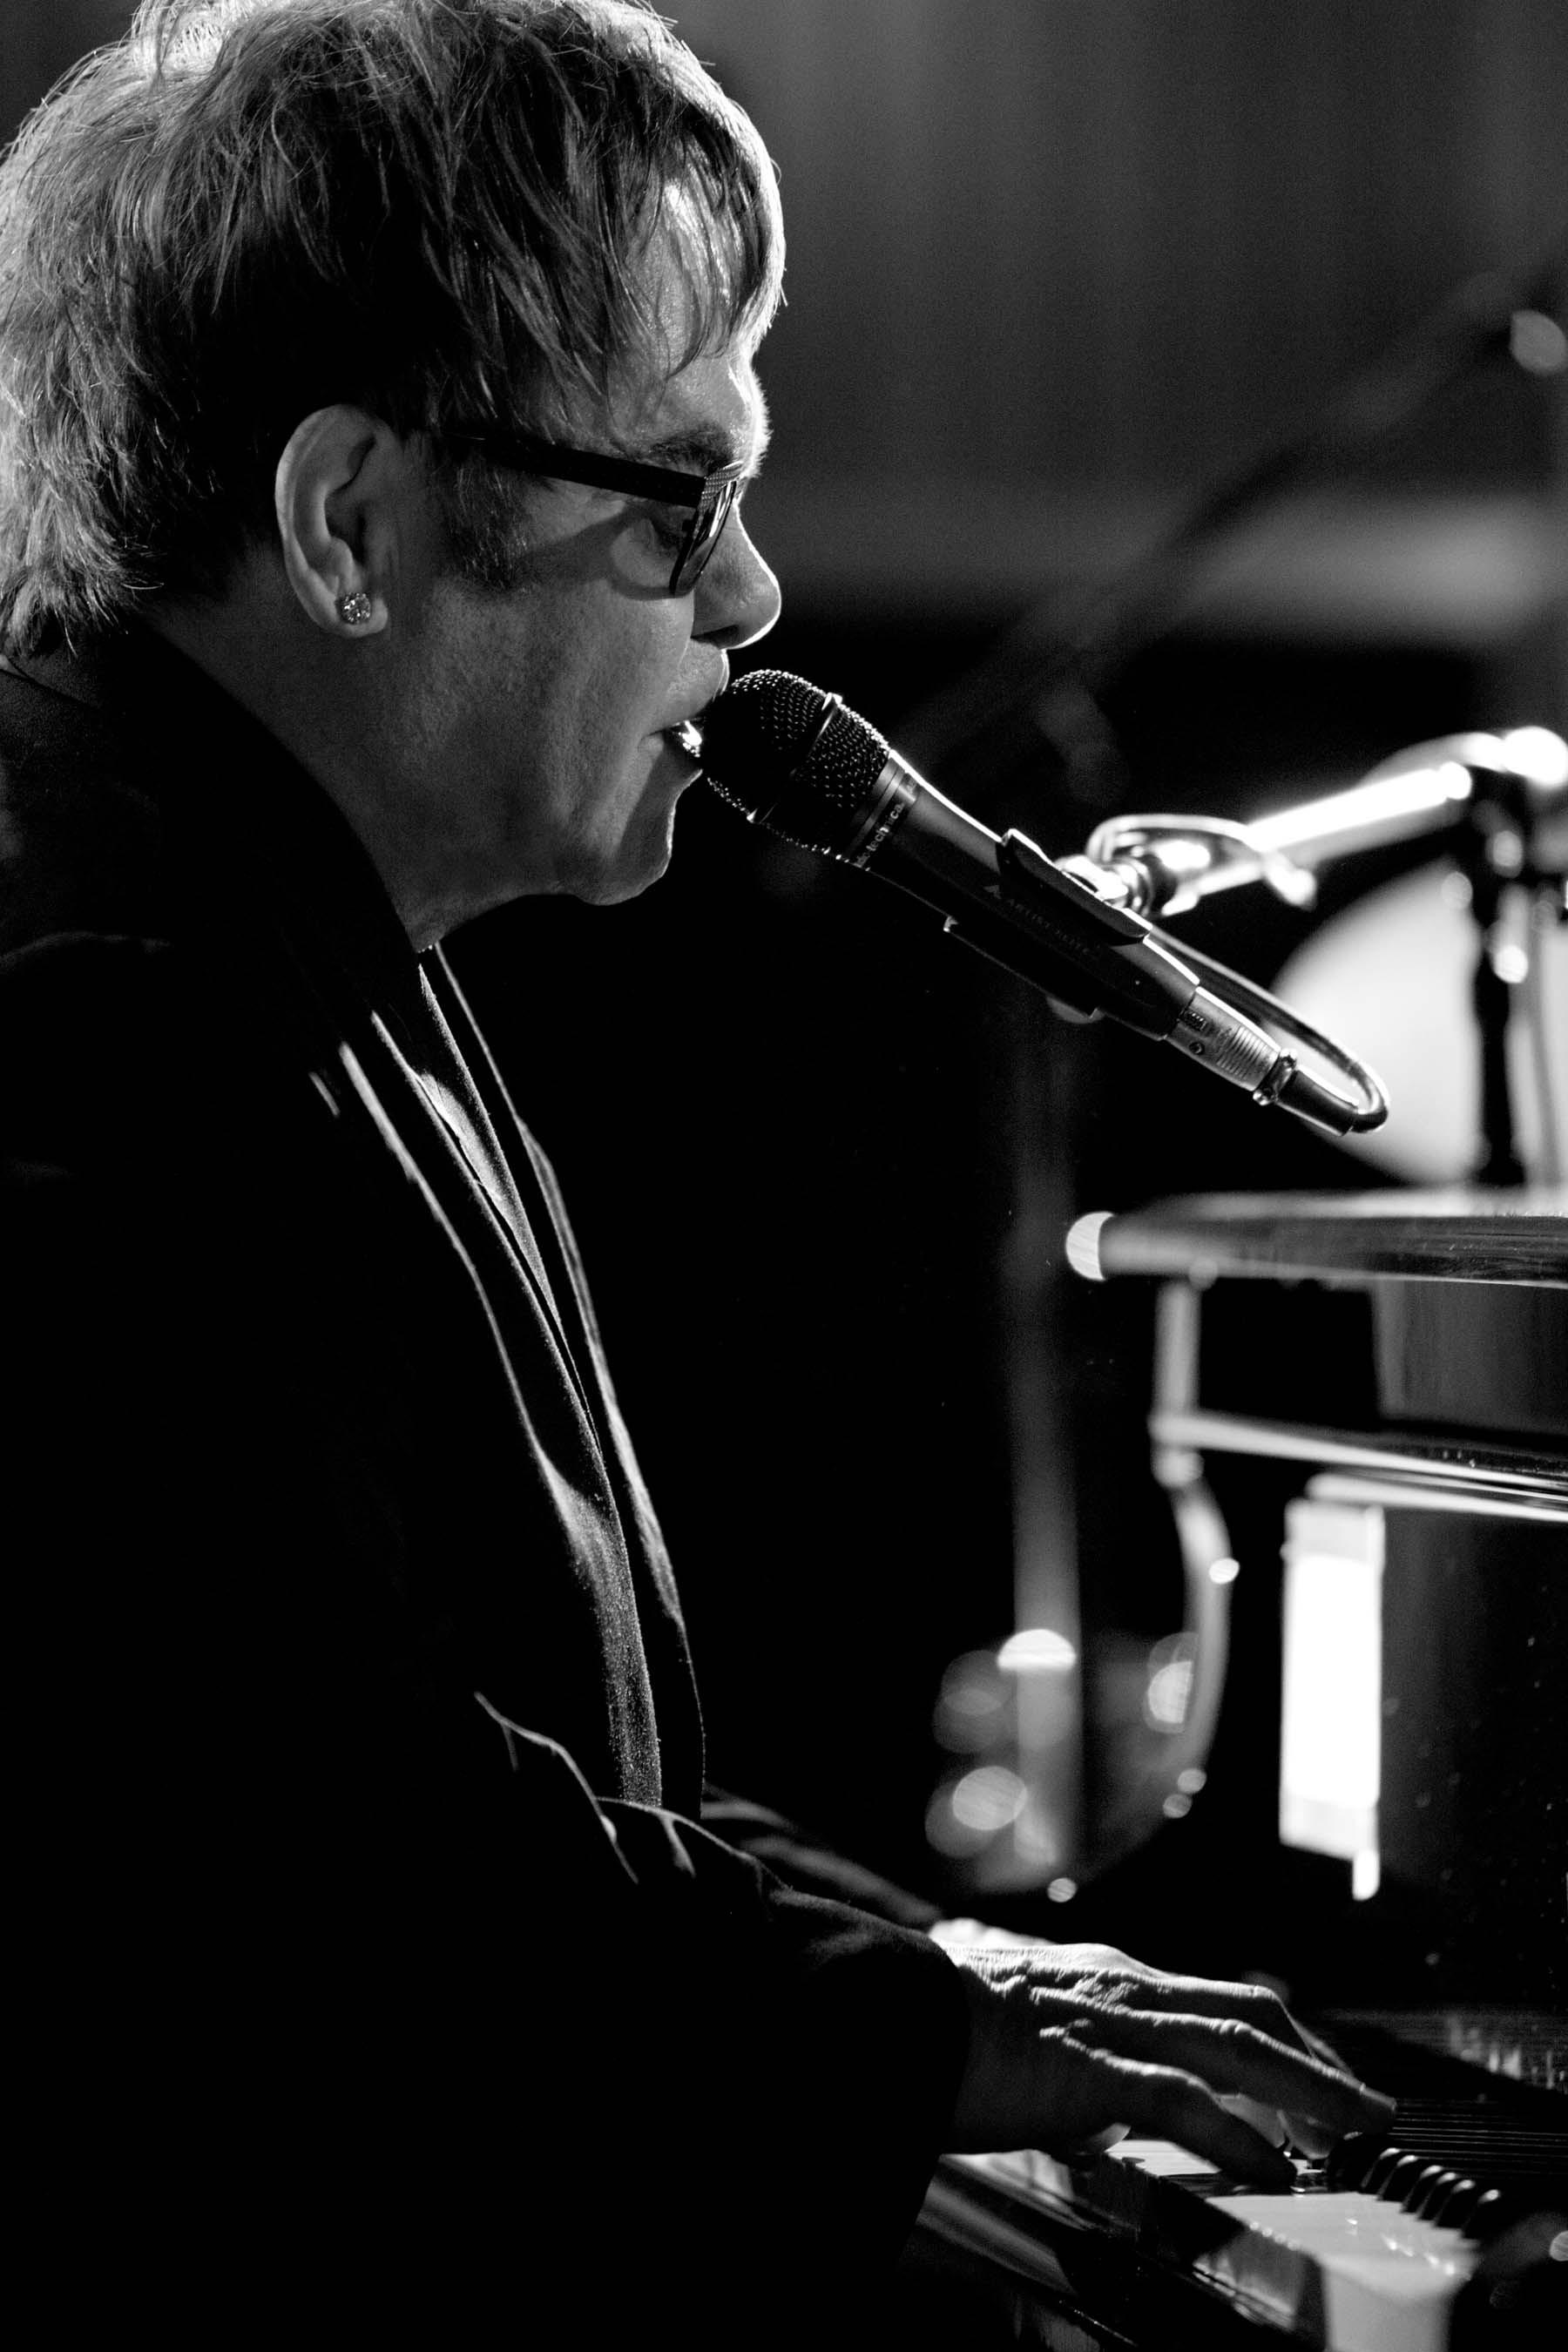 Elton John, iHeartRadio Music Festival 2013 (Photo: Business Wire)